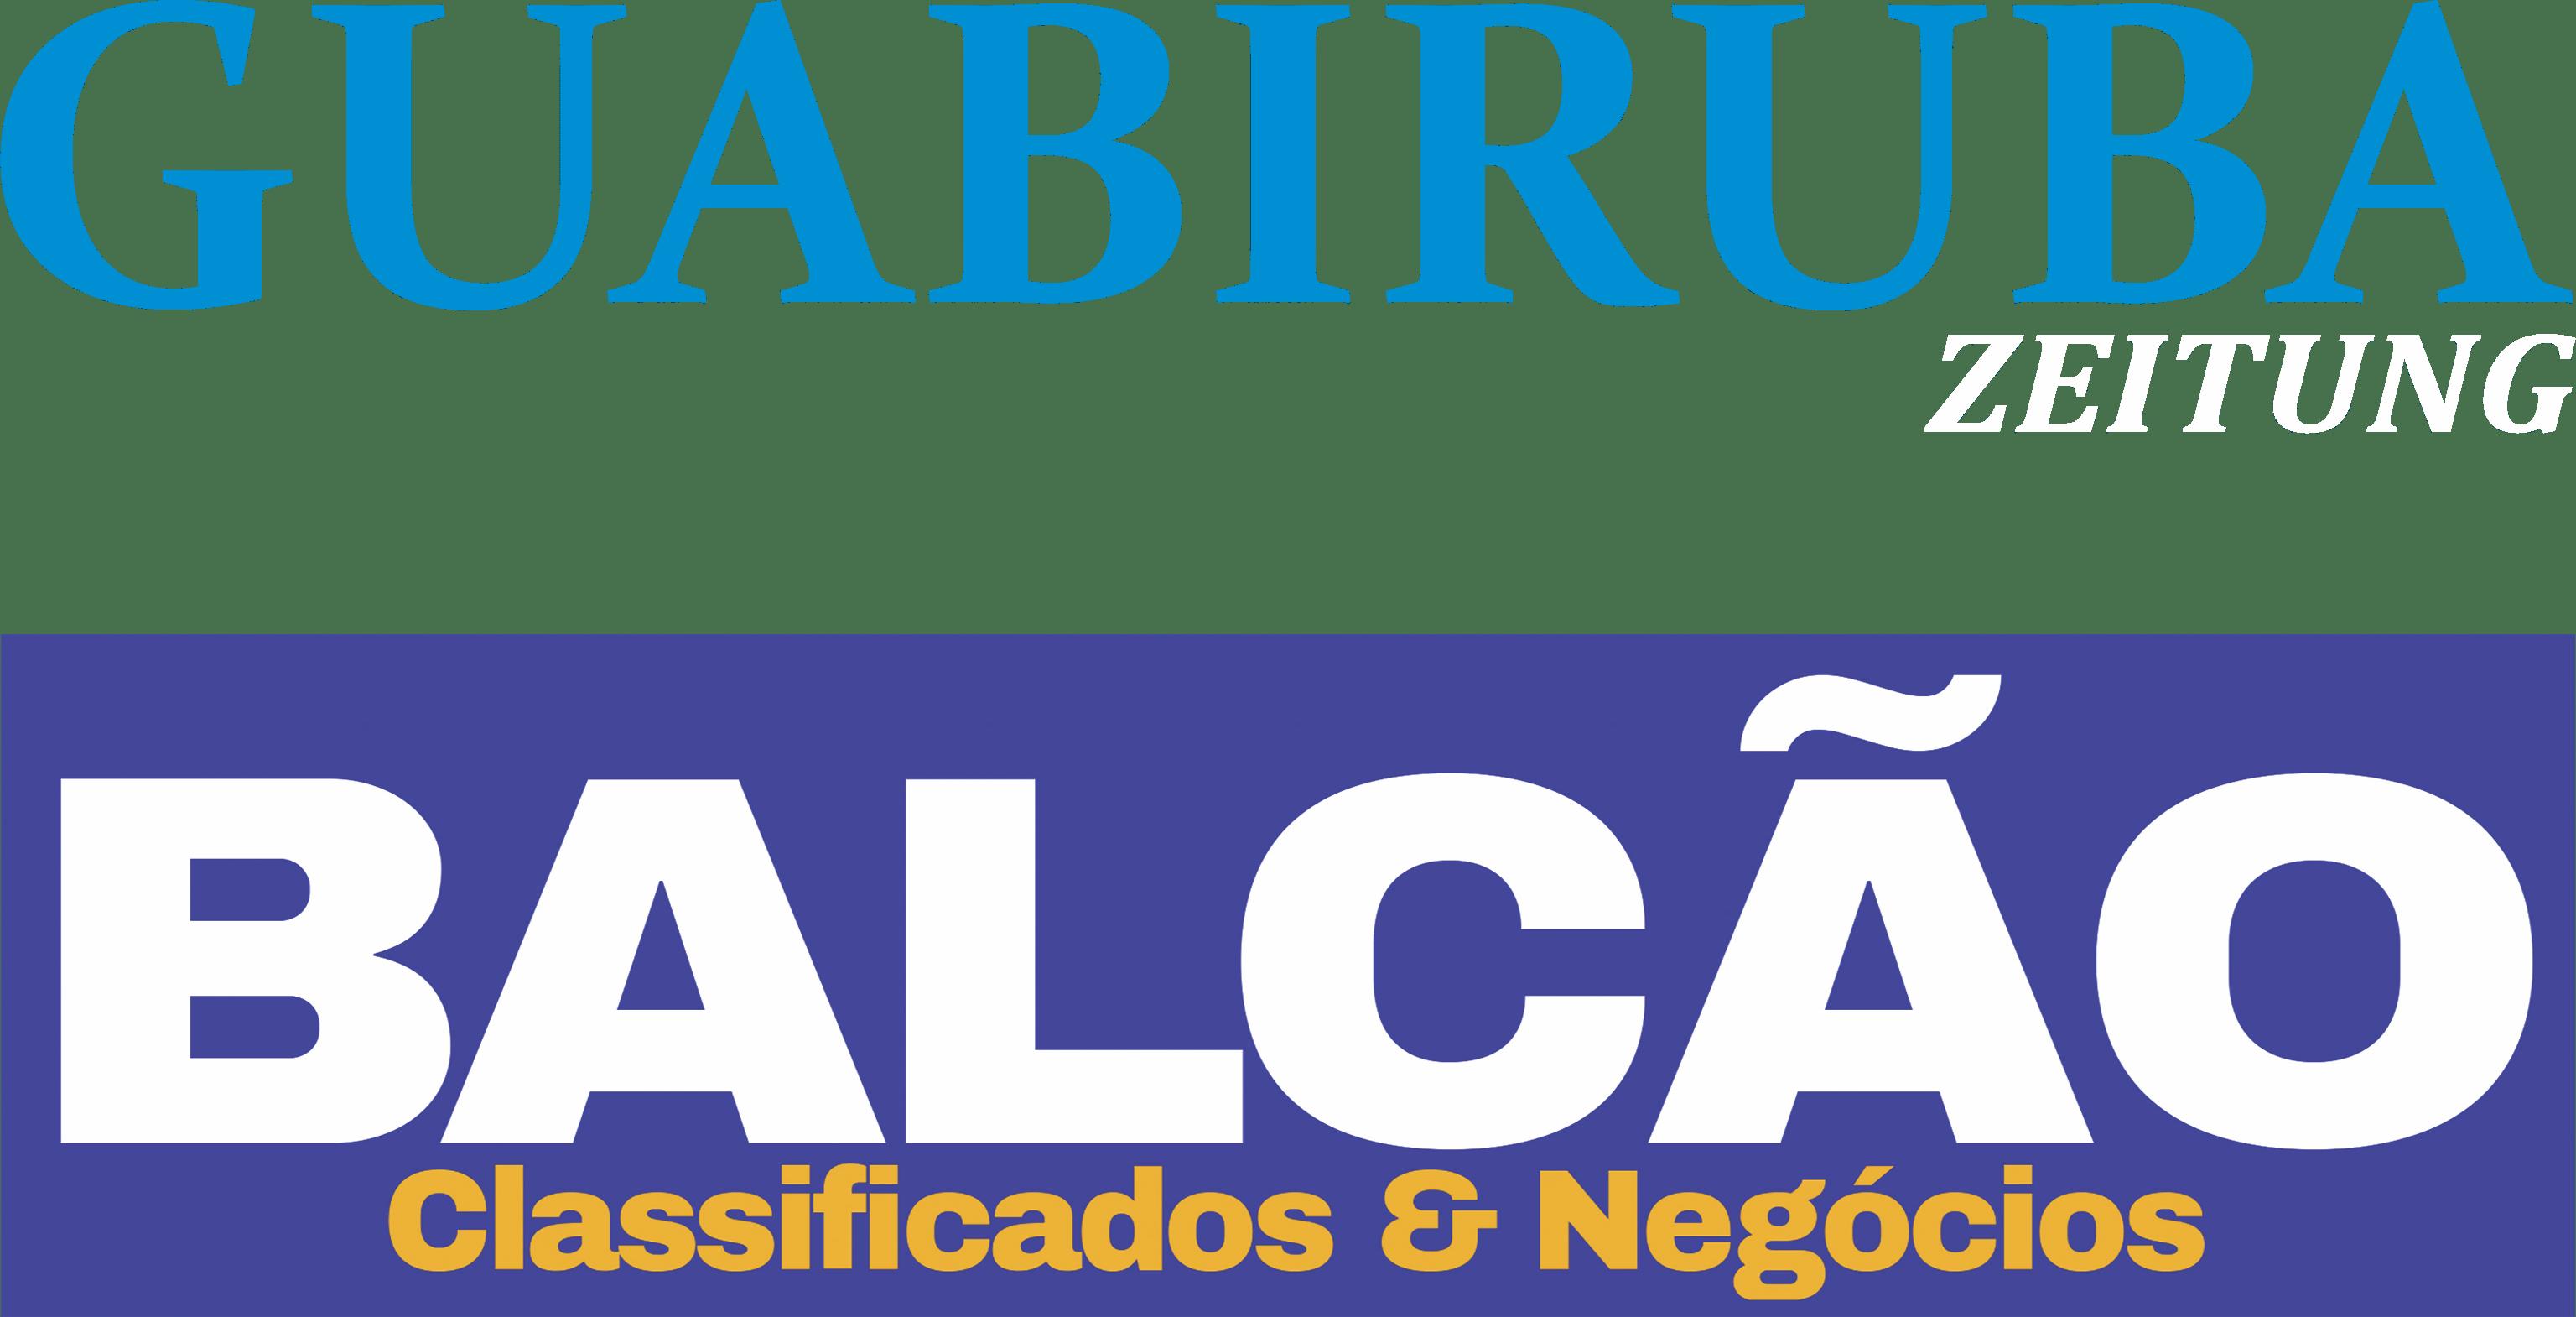 Guabiruba Zeitung